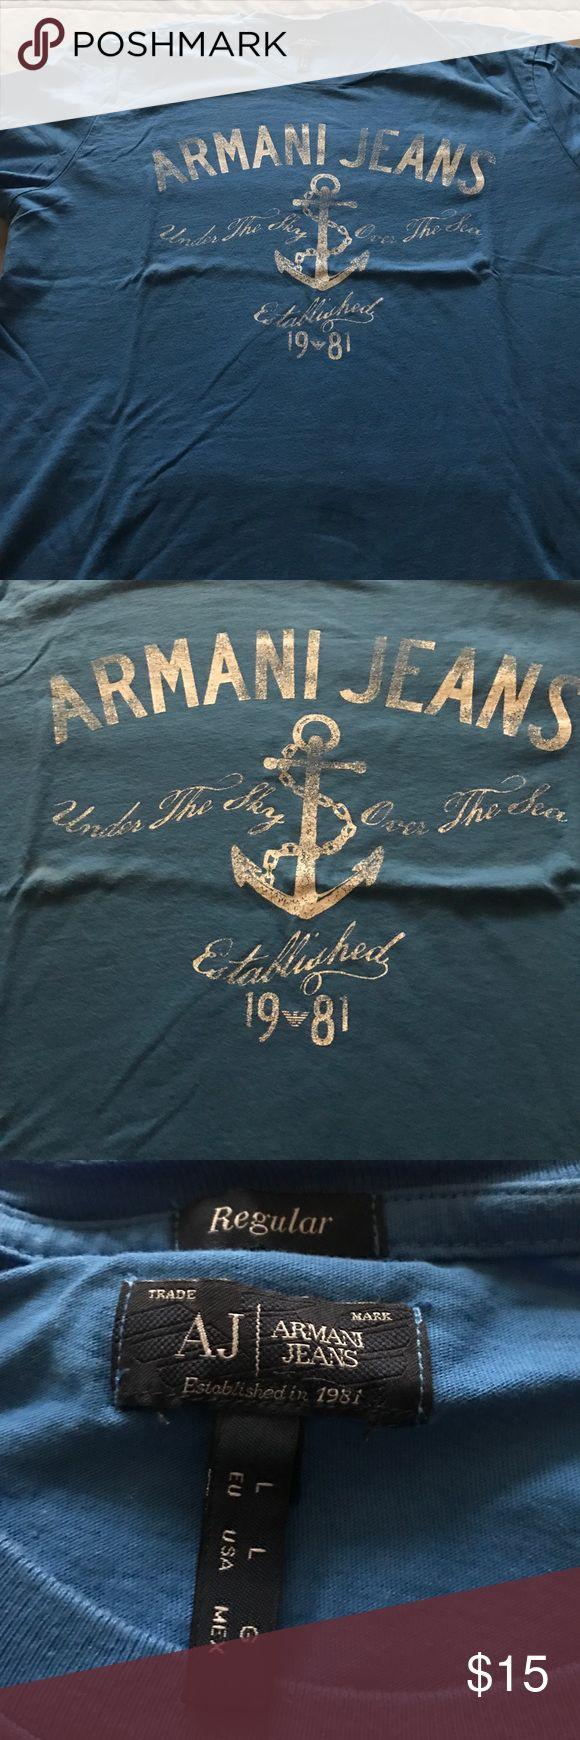 Armani Jeans T Shirt Size L Size Large Armani Jeans Blue T Shirt Armani Jeans Shirts Tees - Short Sleeve